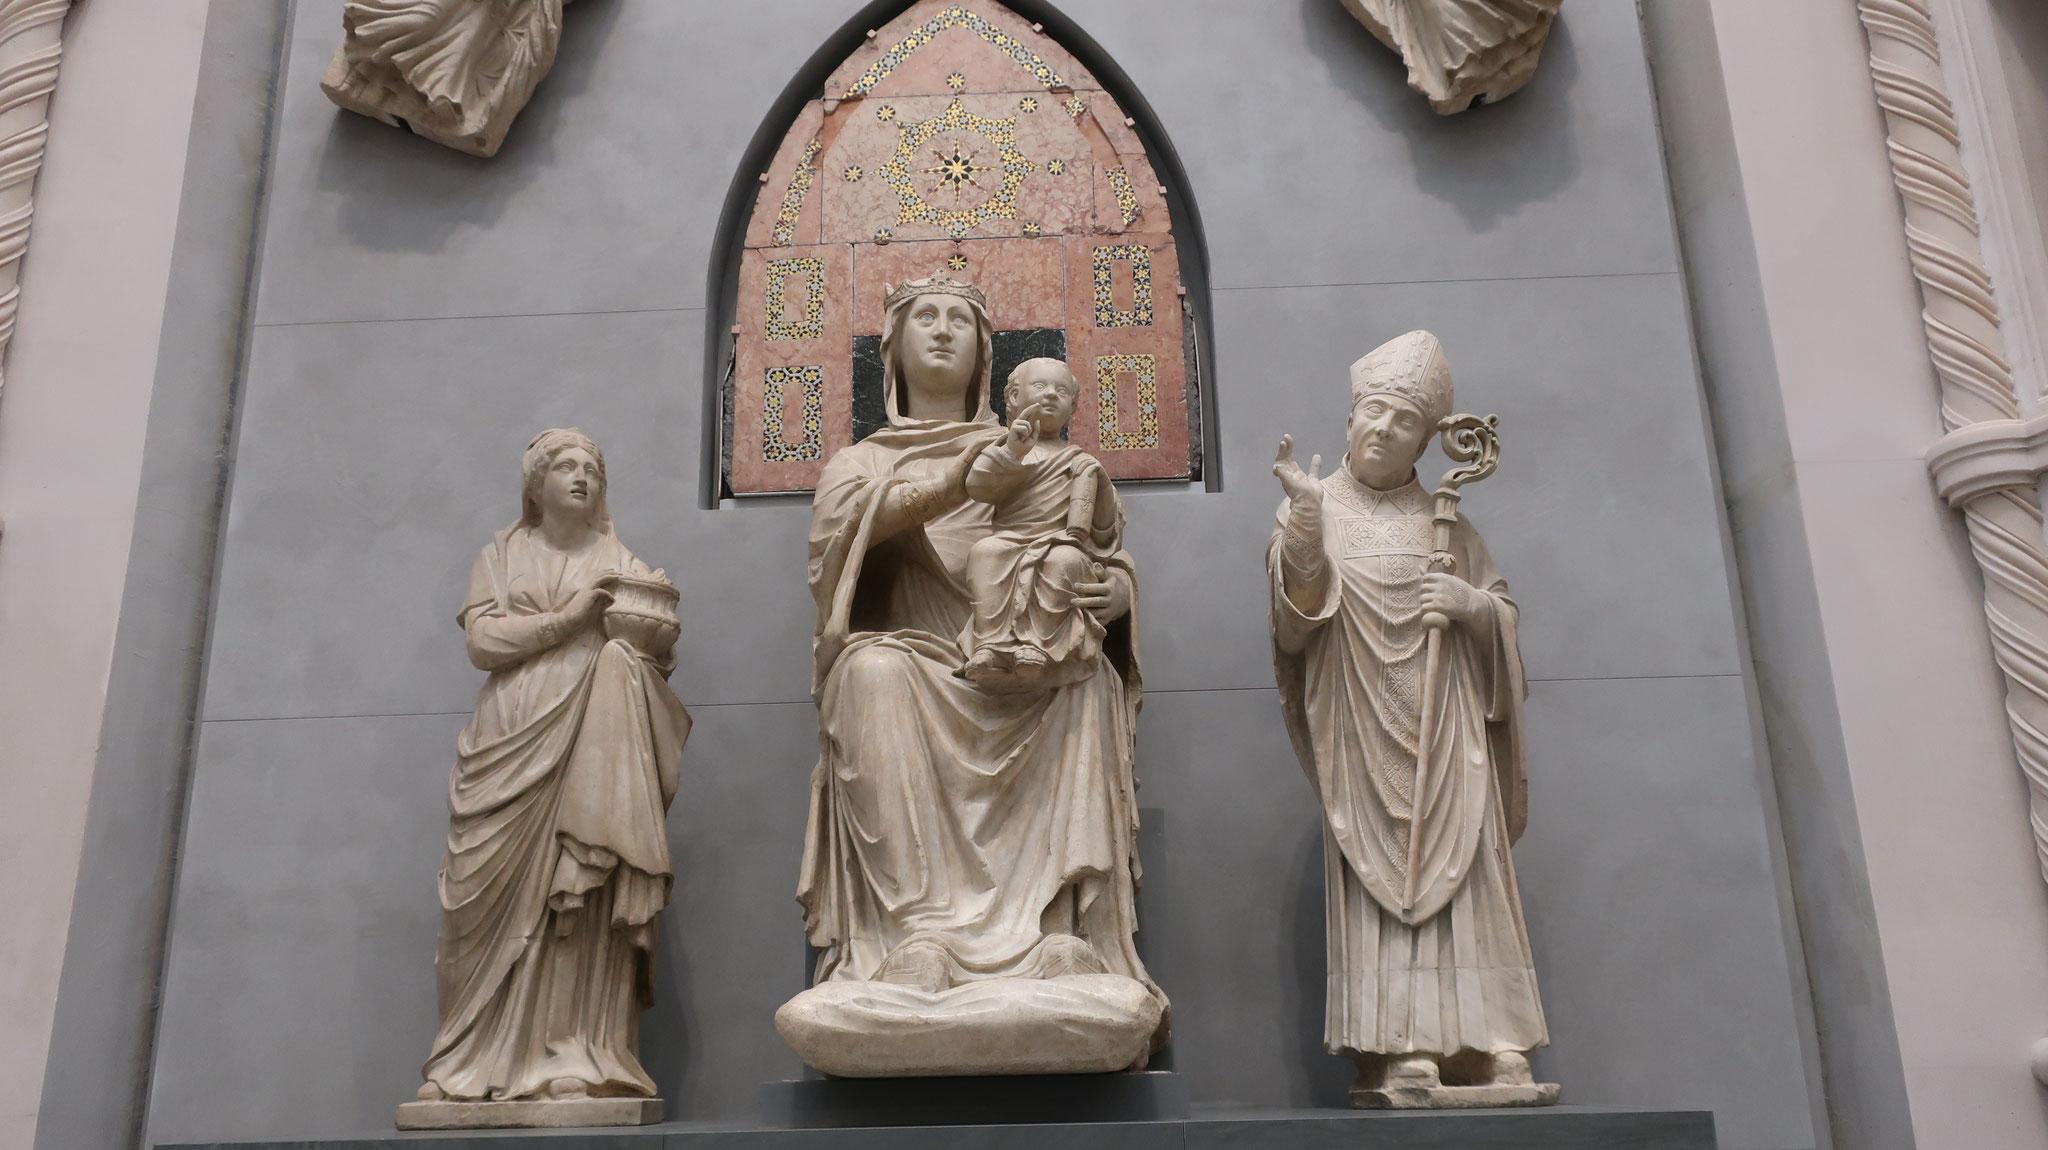 ドゥオーモ(大聖堂)付属美術館。聖母子像。